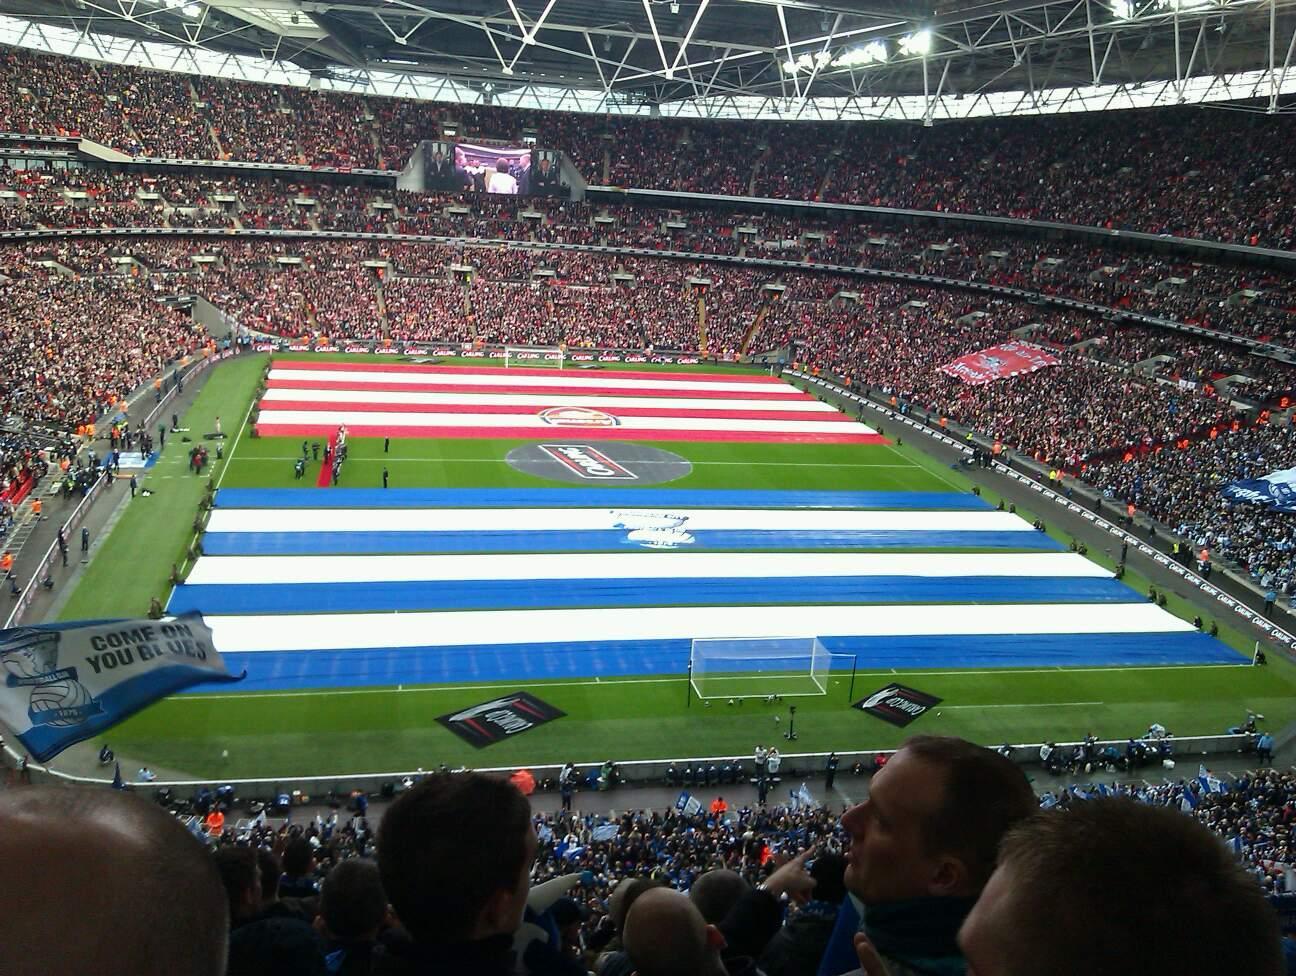 Wembley Stadium Section 541 Row 11 Seat 47